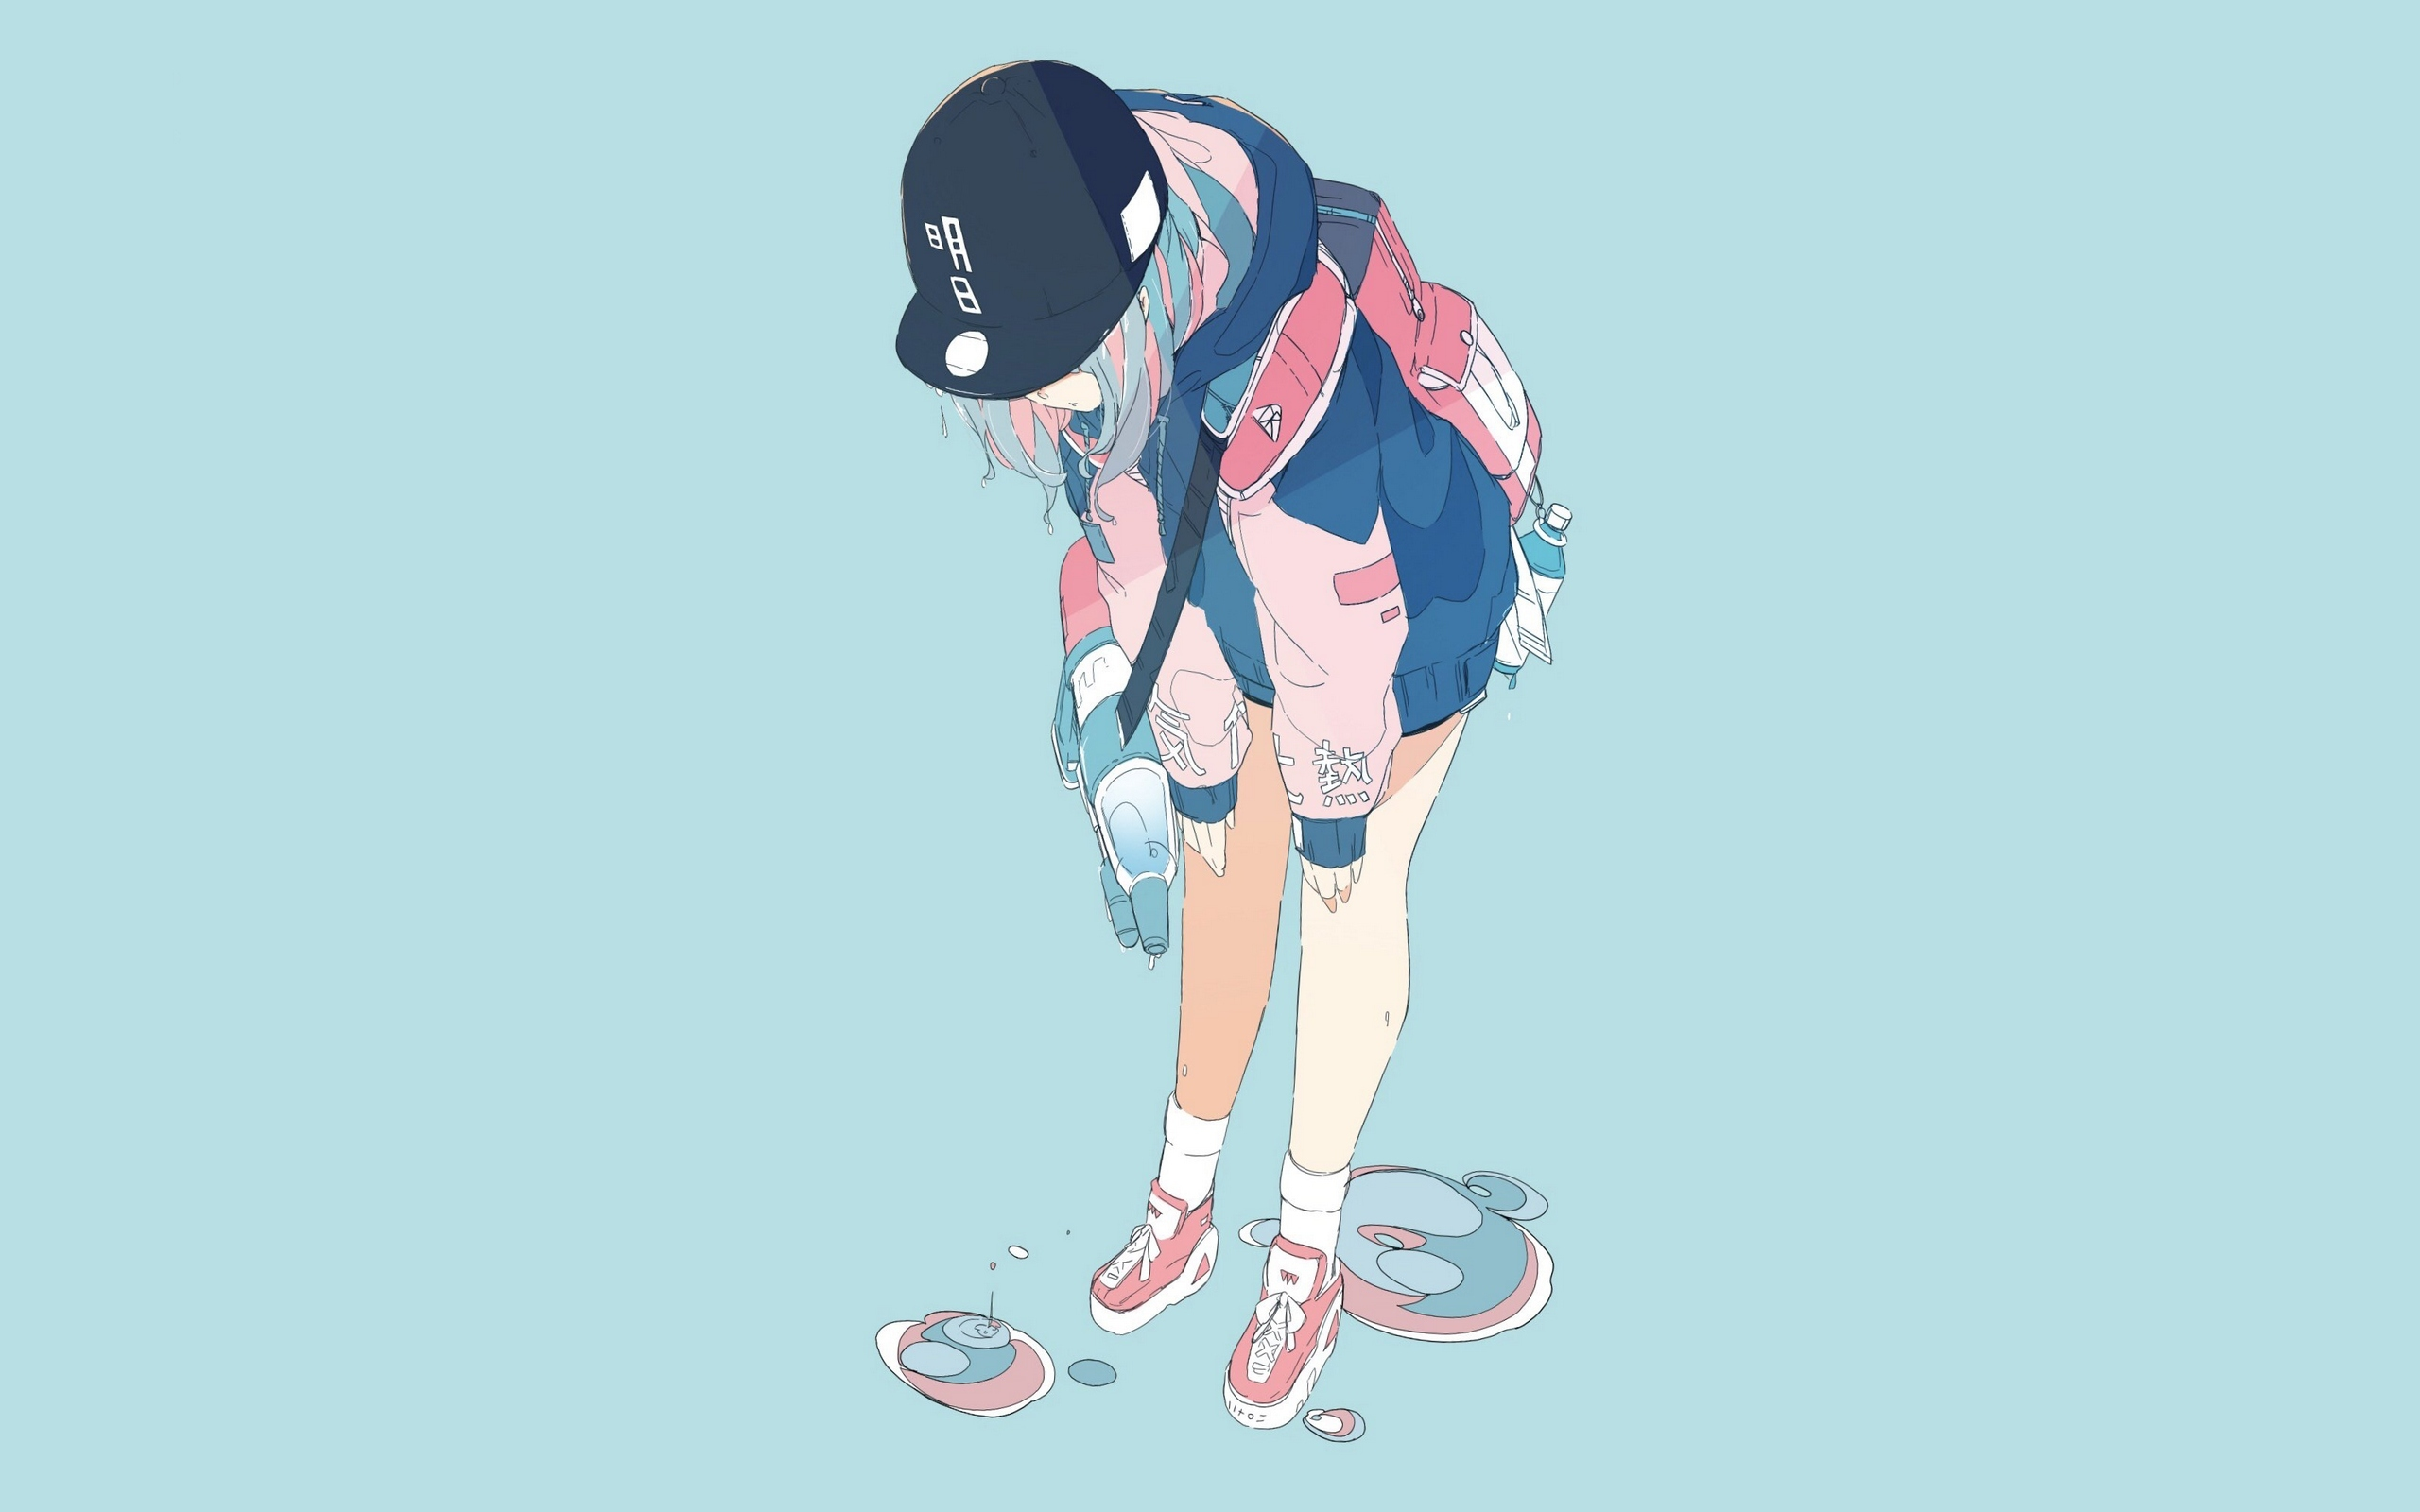 Anime 2560x1600 simple background anime girls blue background hat anime daisukerichard